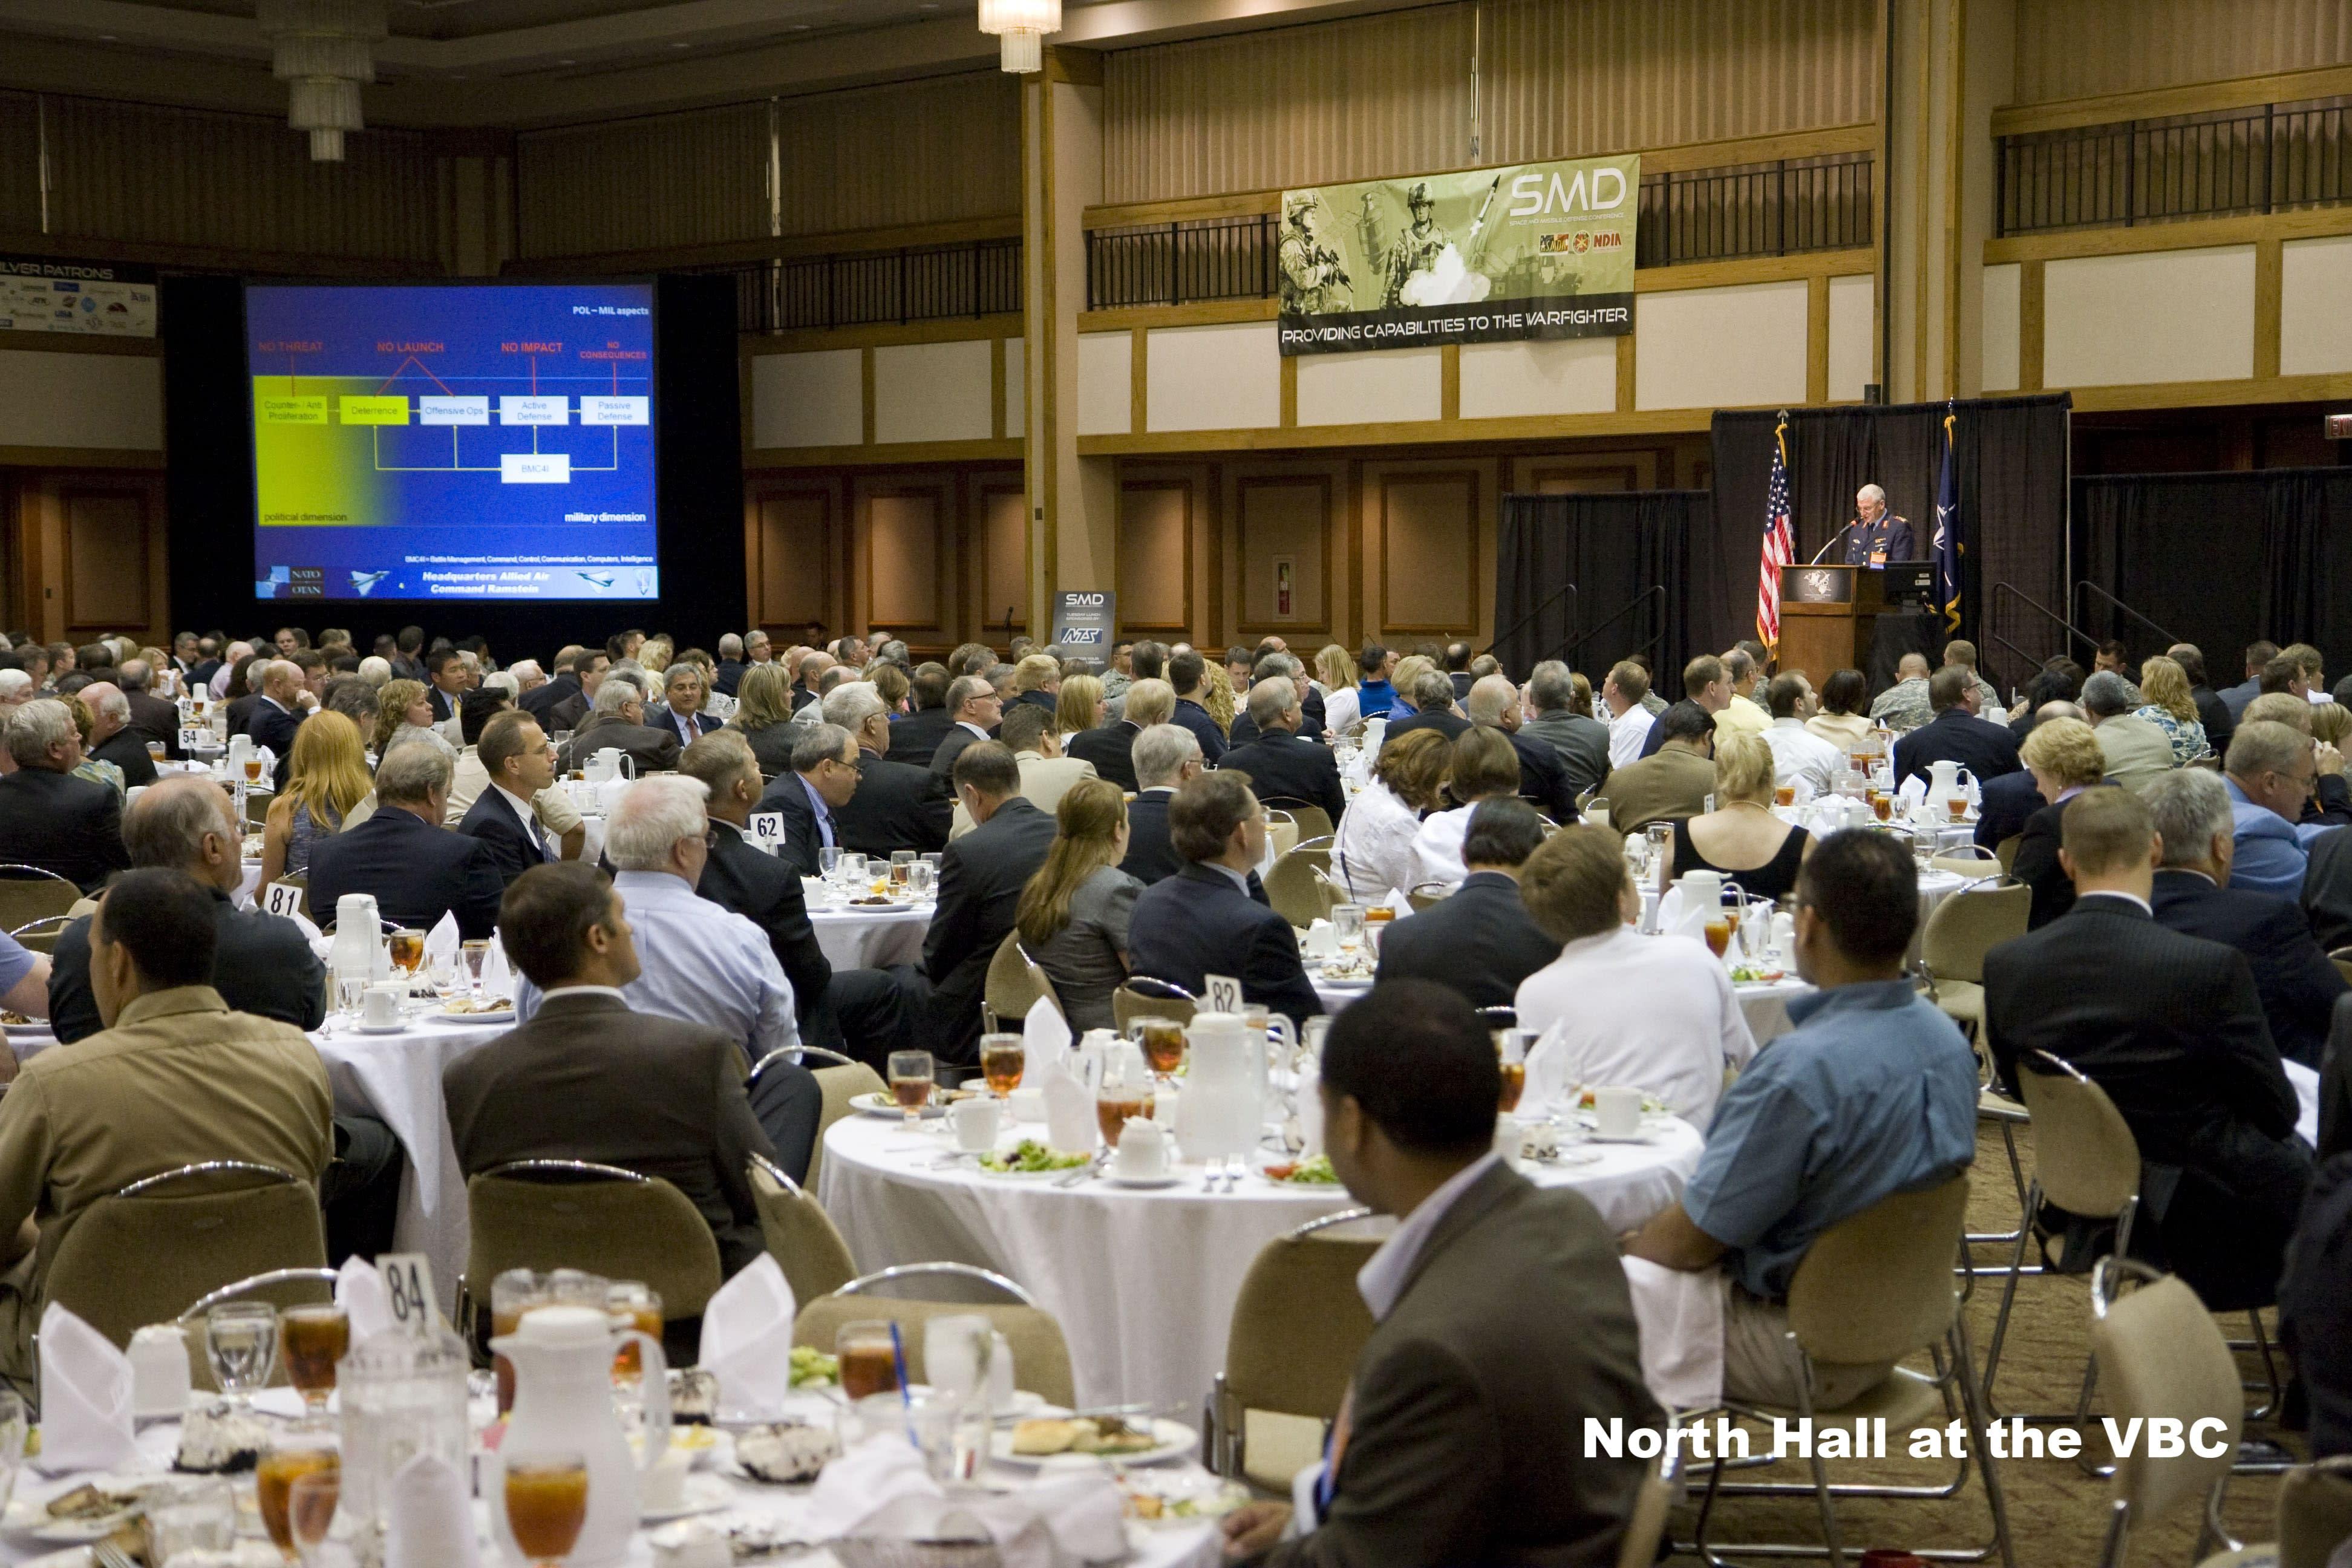 North Hall at the VBC